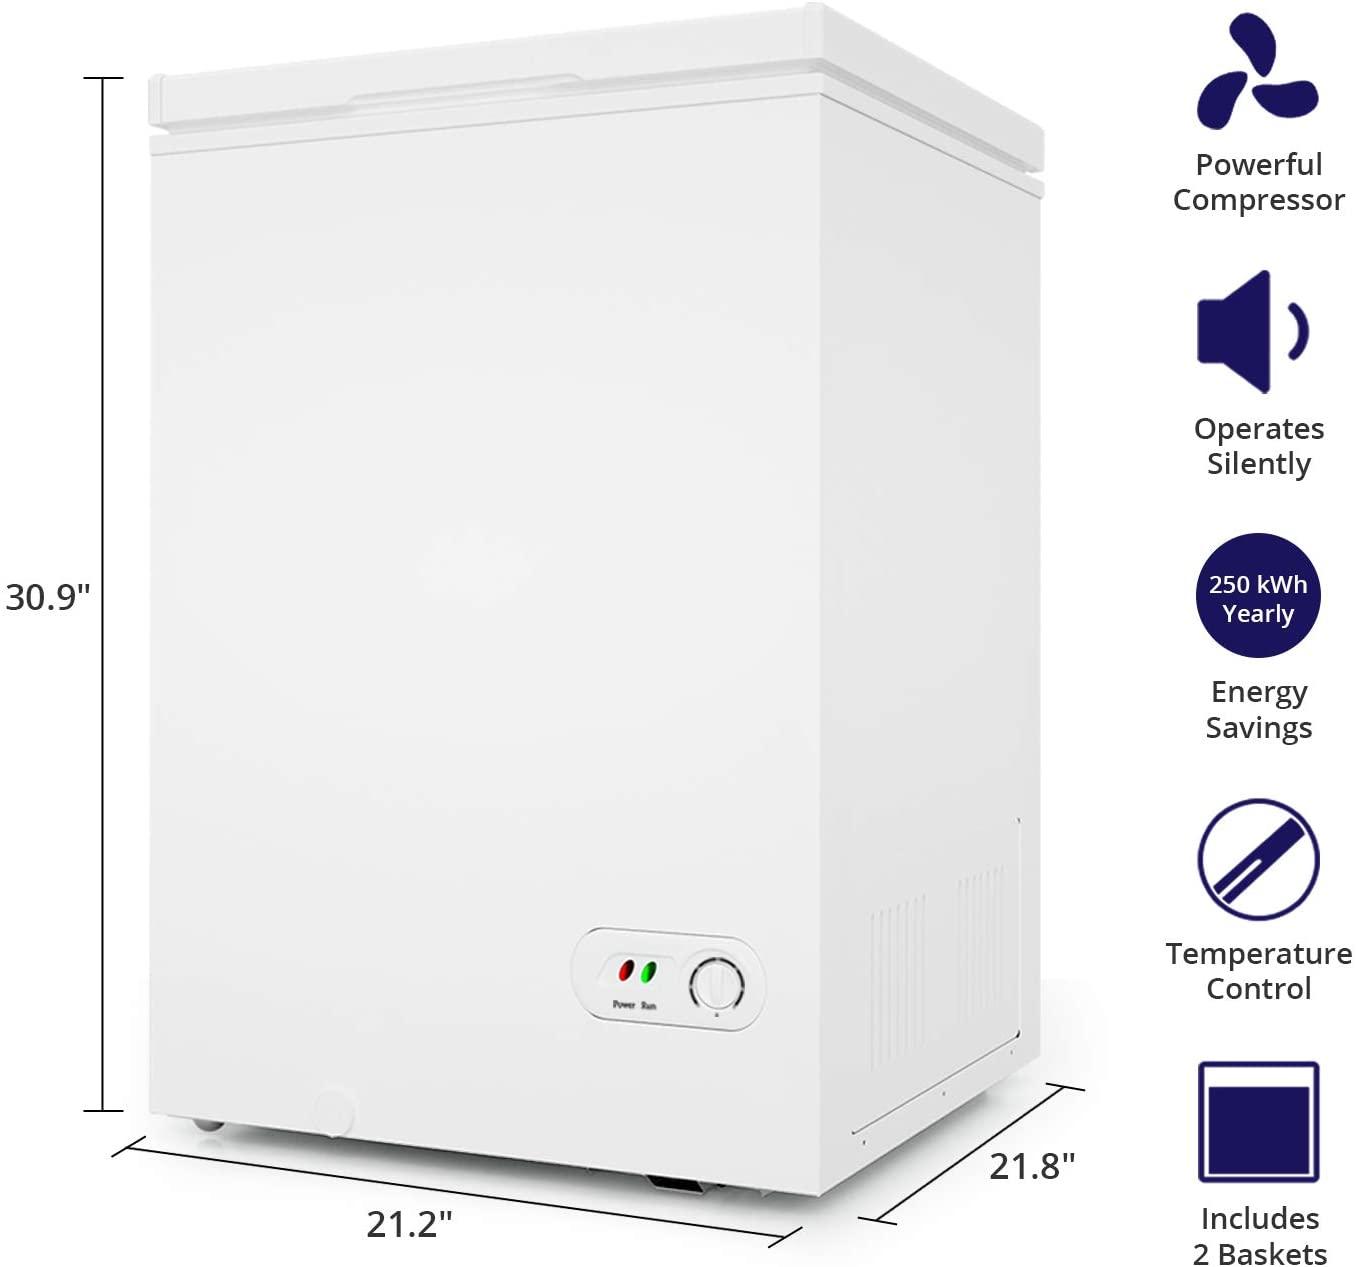 Northair Chest Freezer - 3.5 Cu Ft  Specs